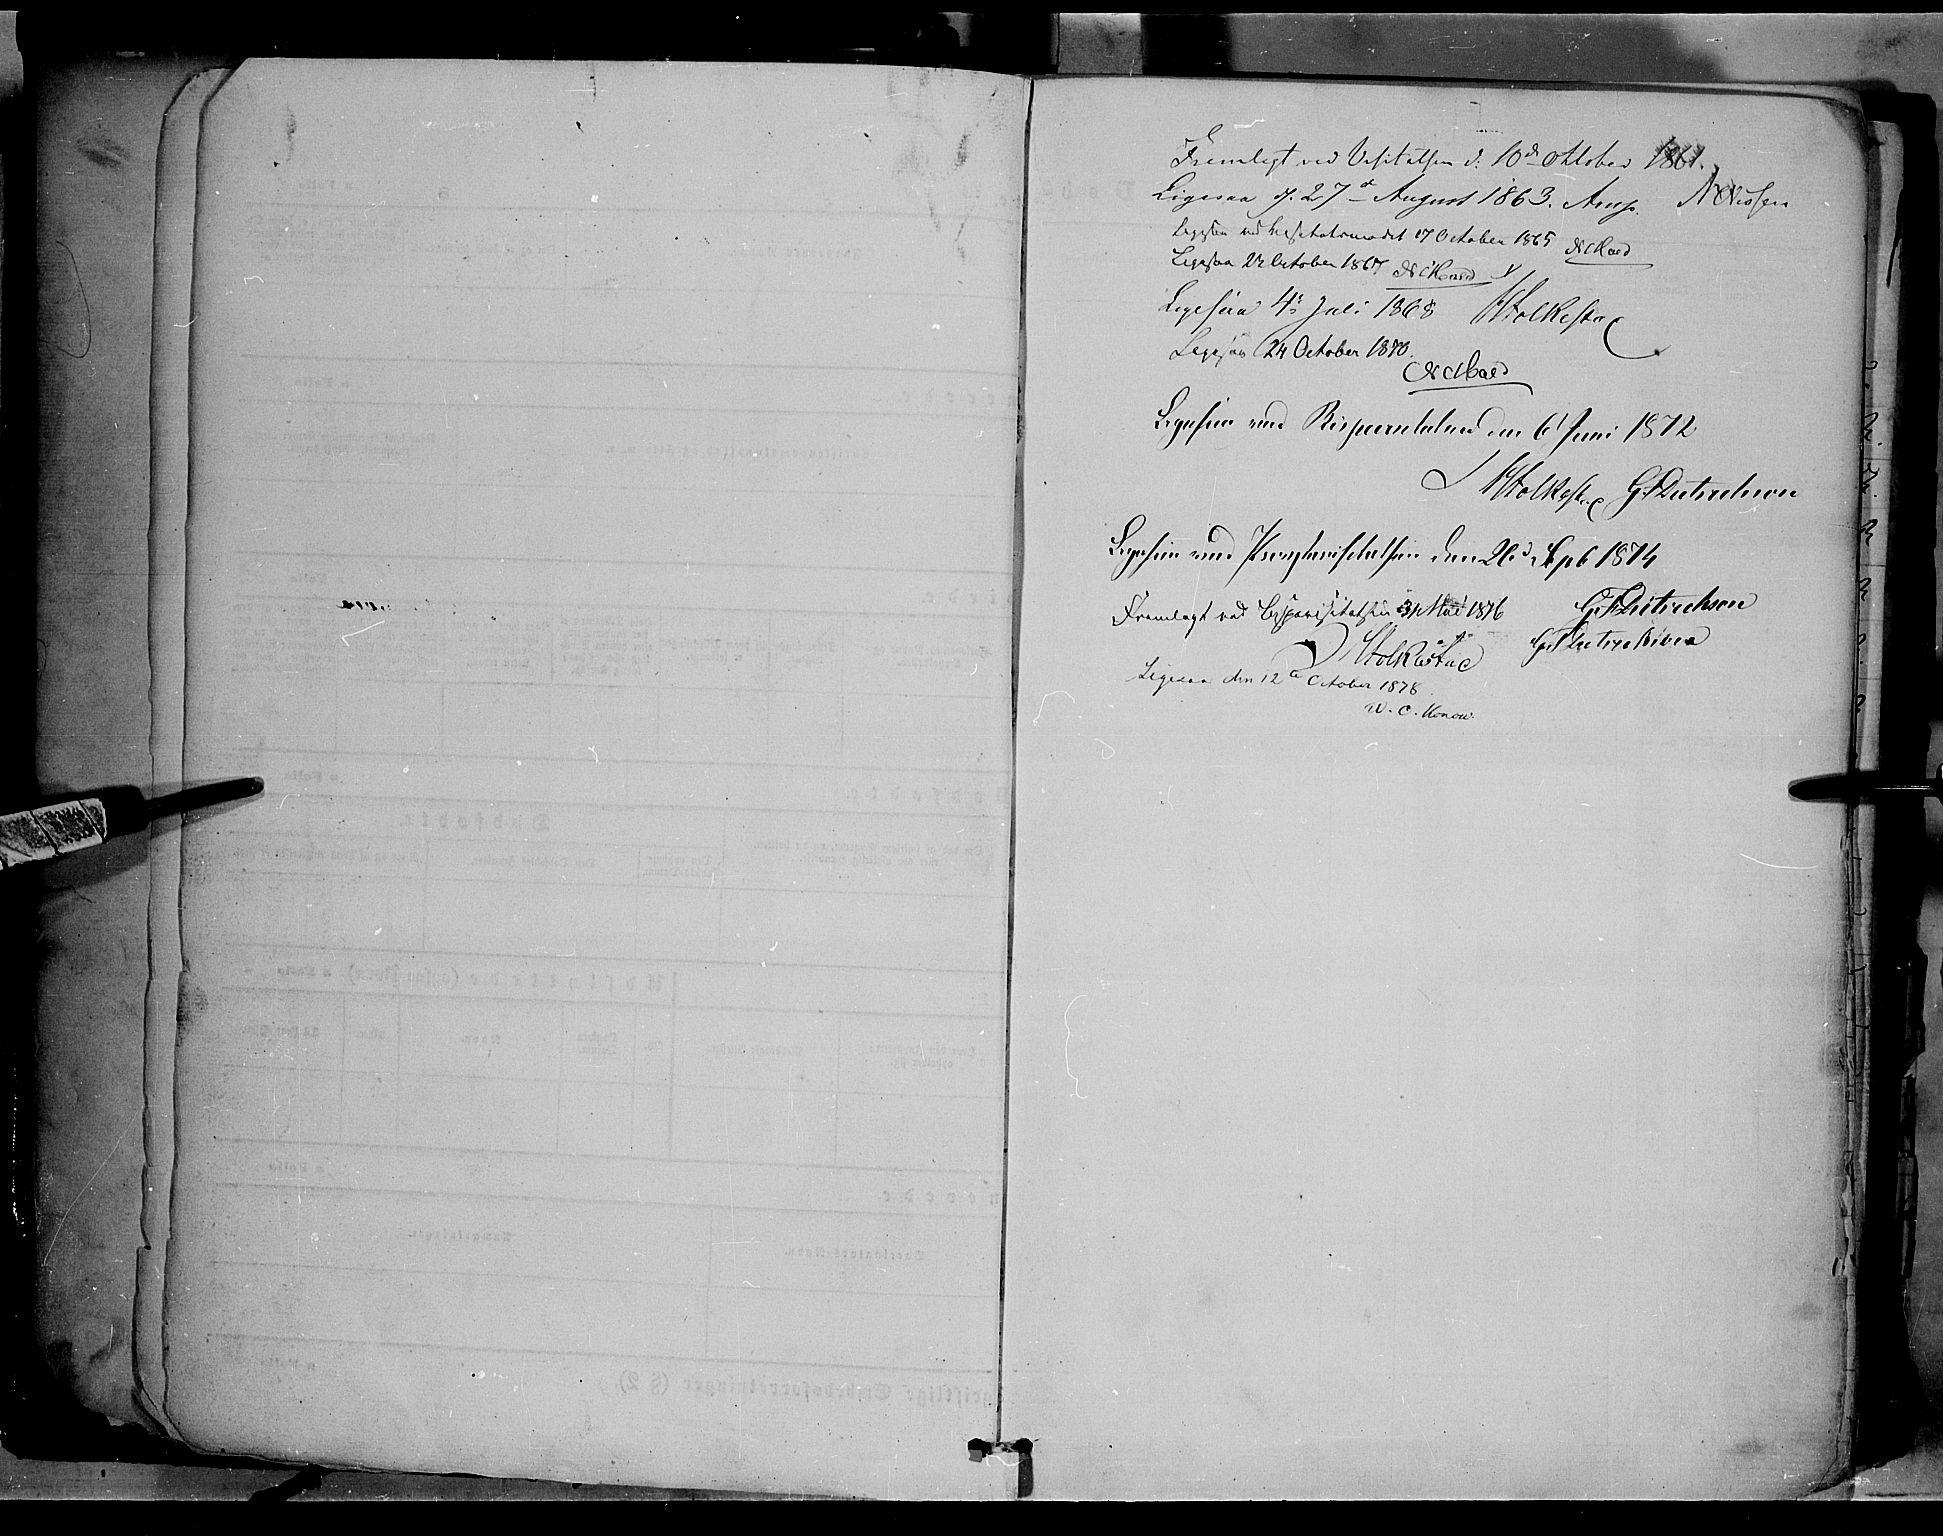 SAH, Ringebu prestekontor, Ministerialbok nr. 7, 1860-1877